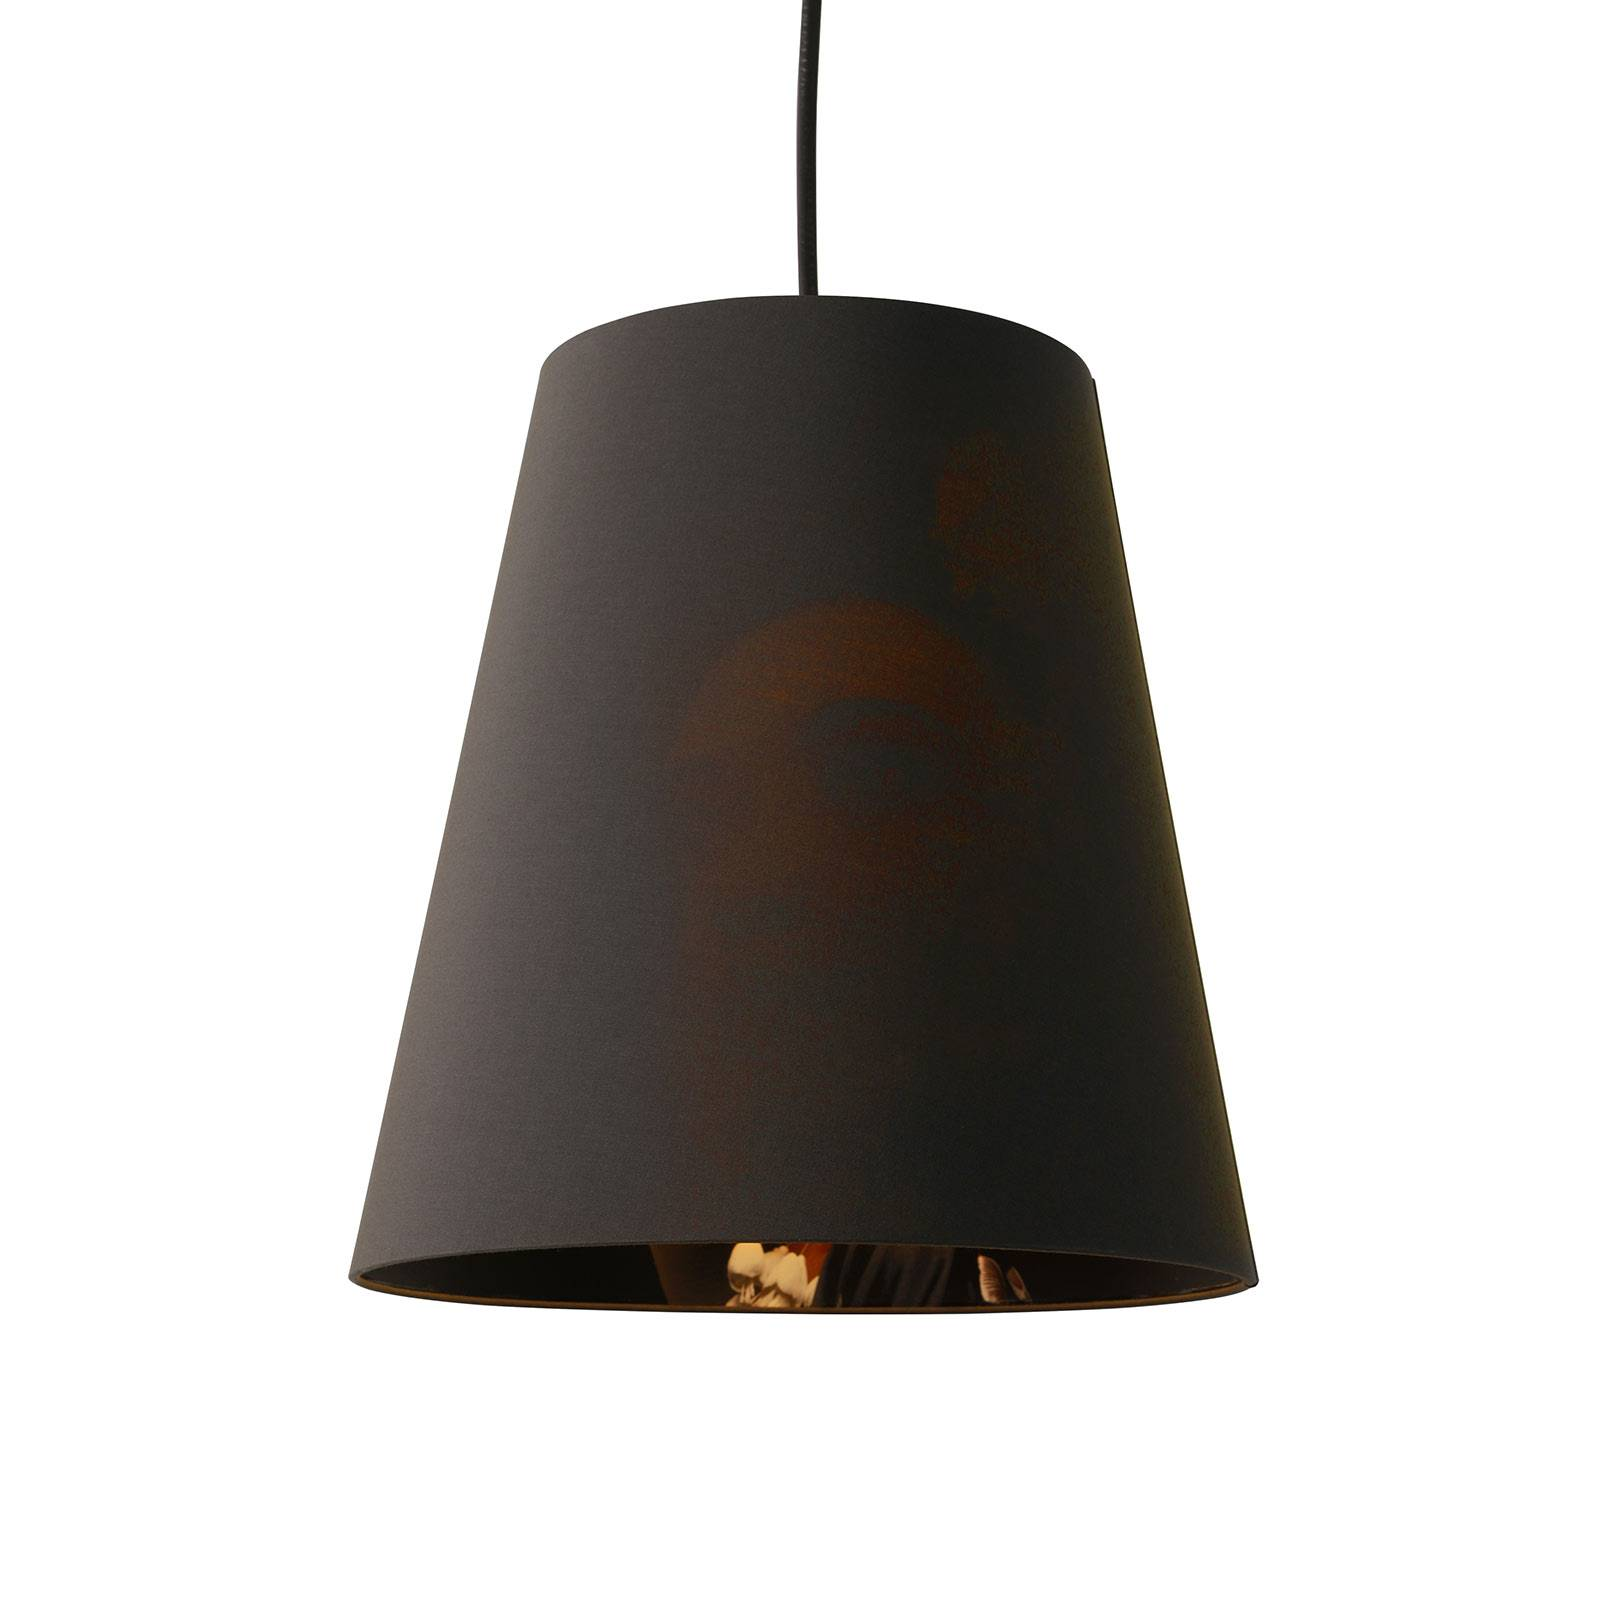 Karman Cupido hanglamp met kap Ø 26 cm